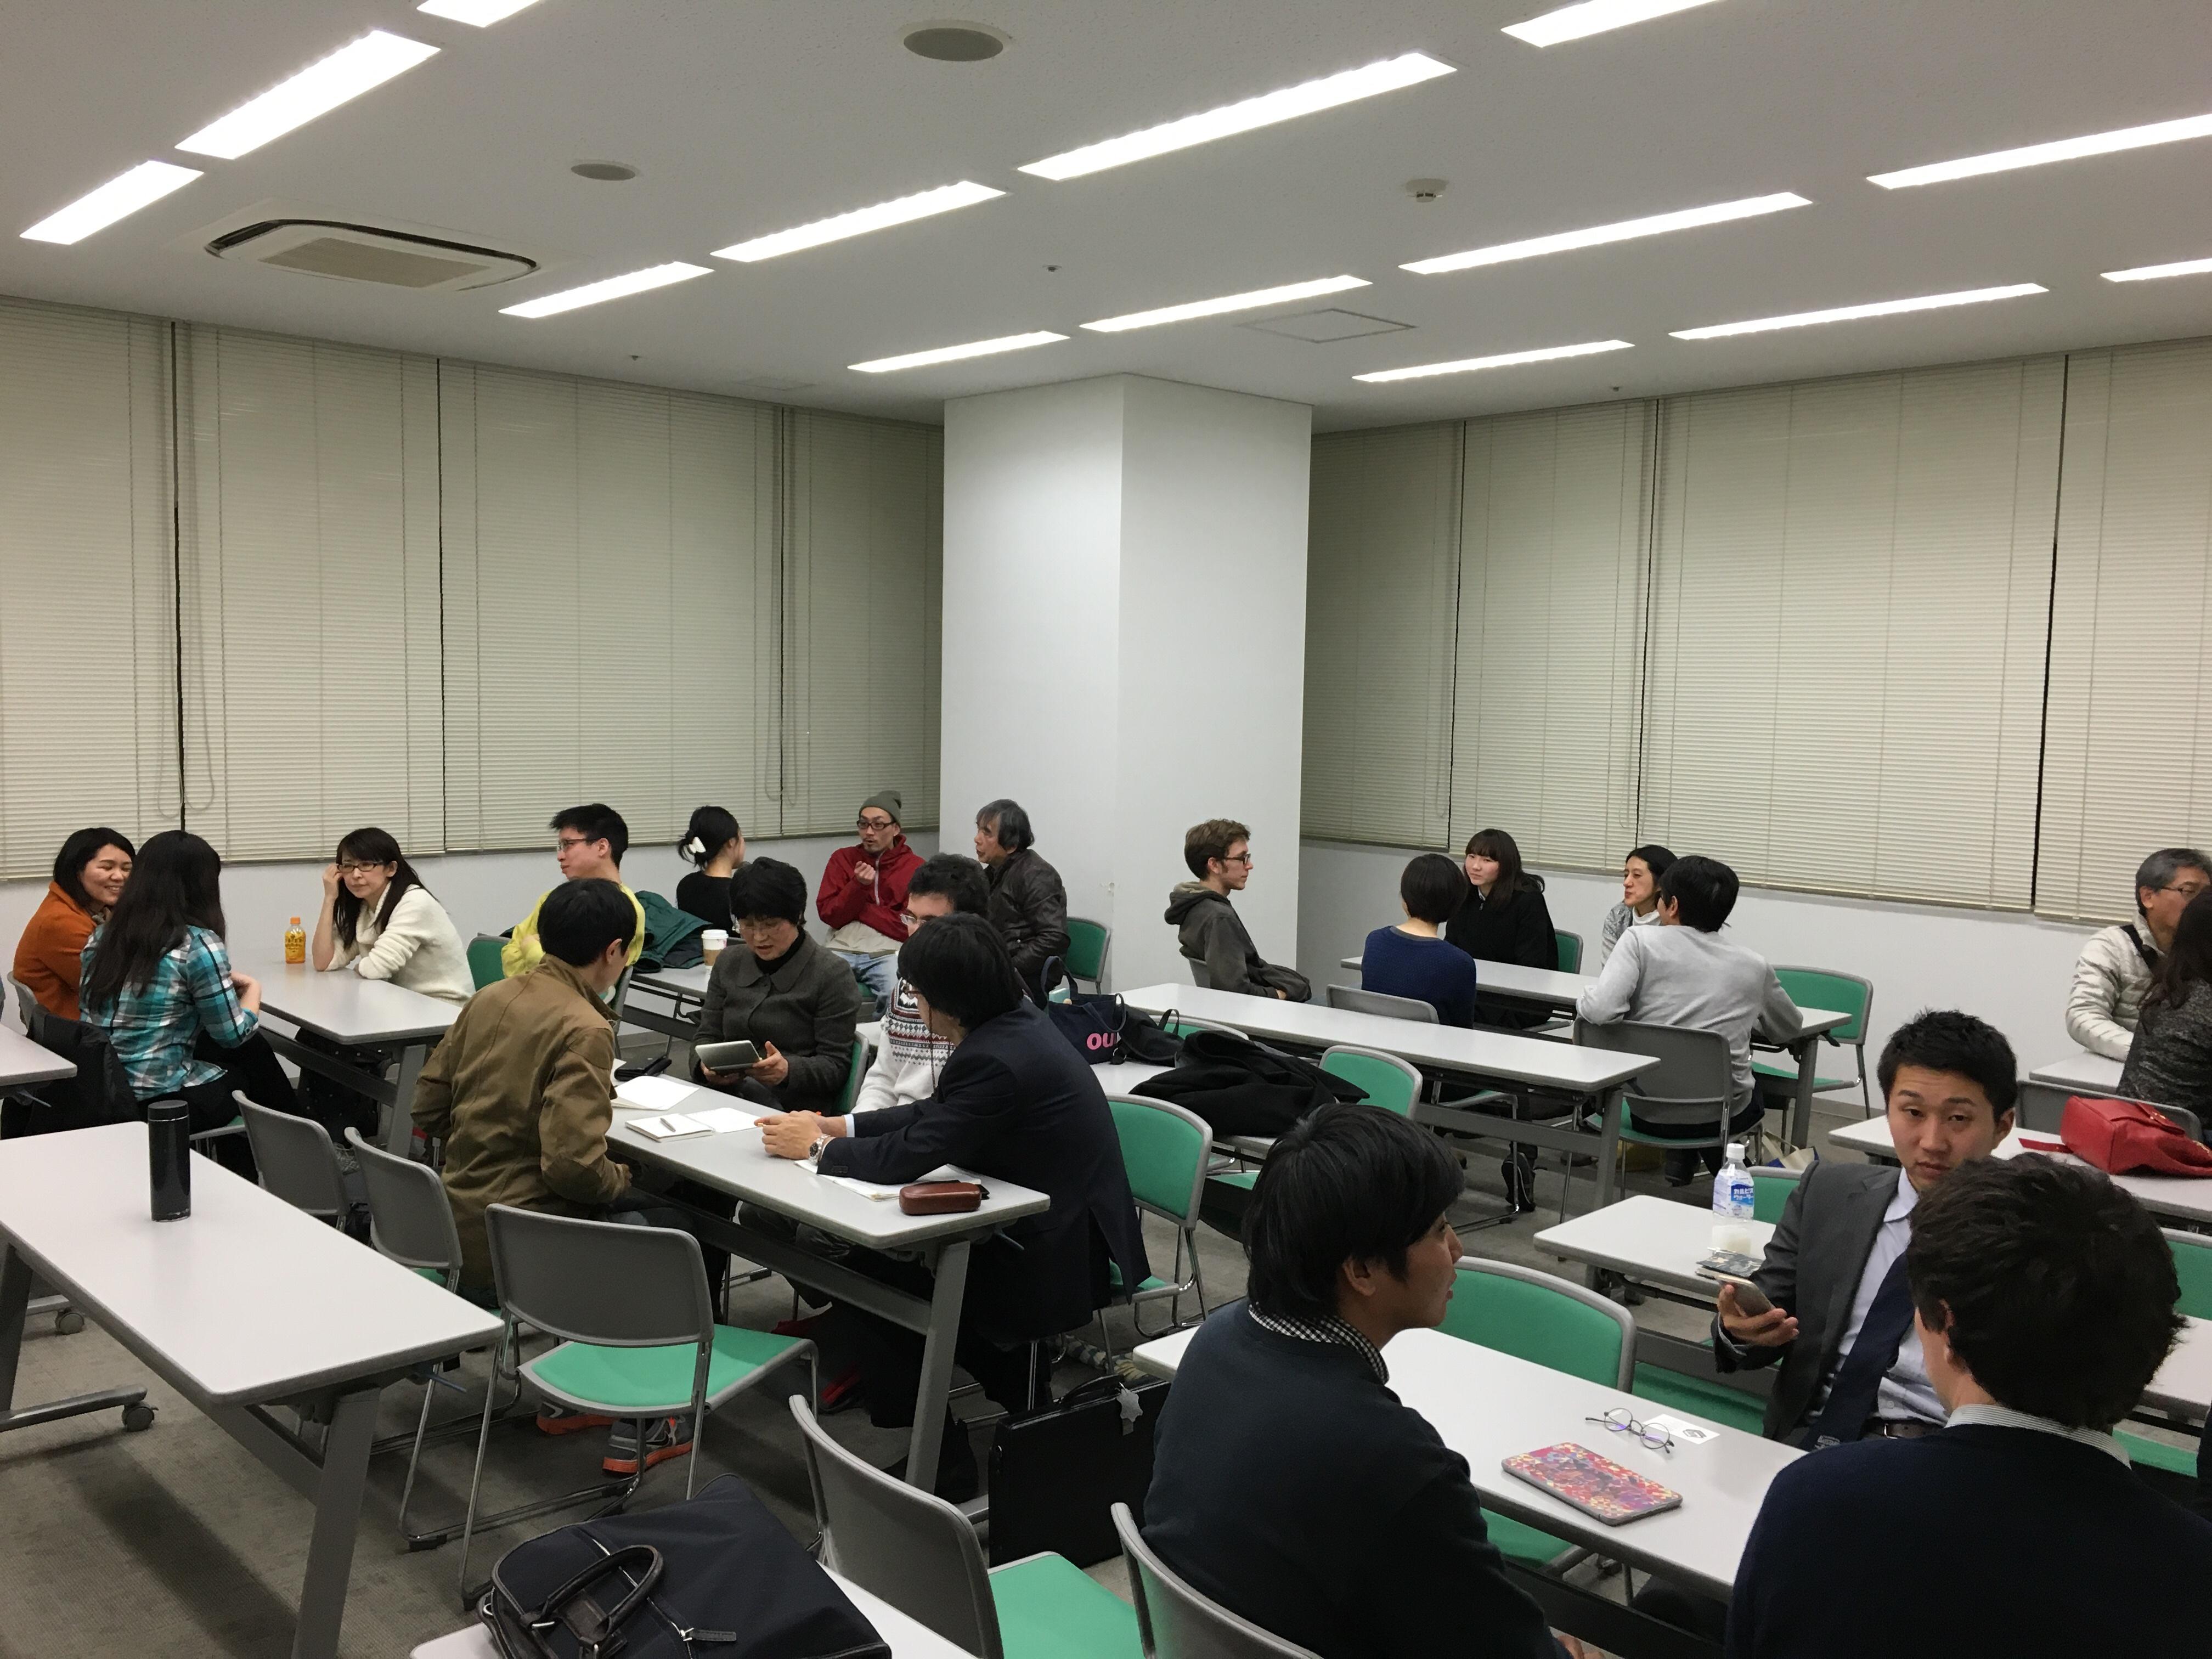 find a language exchange partner english japanese